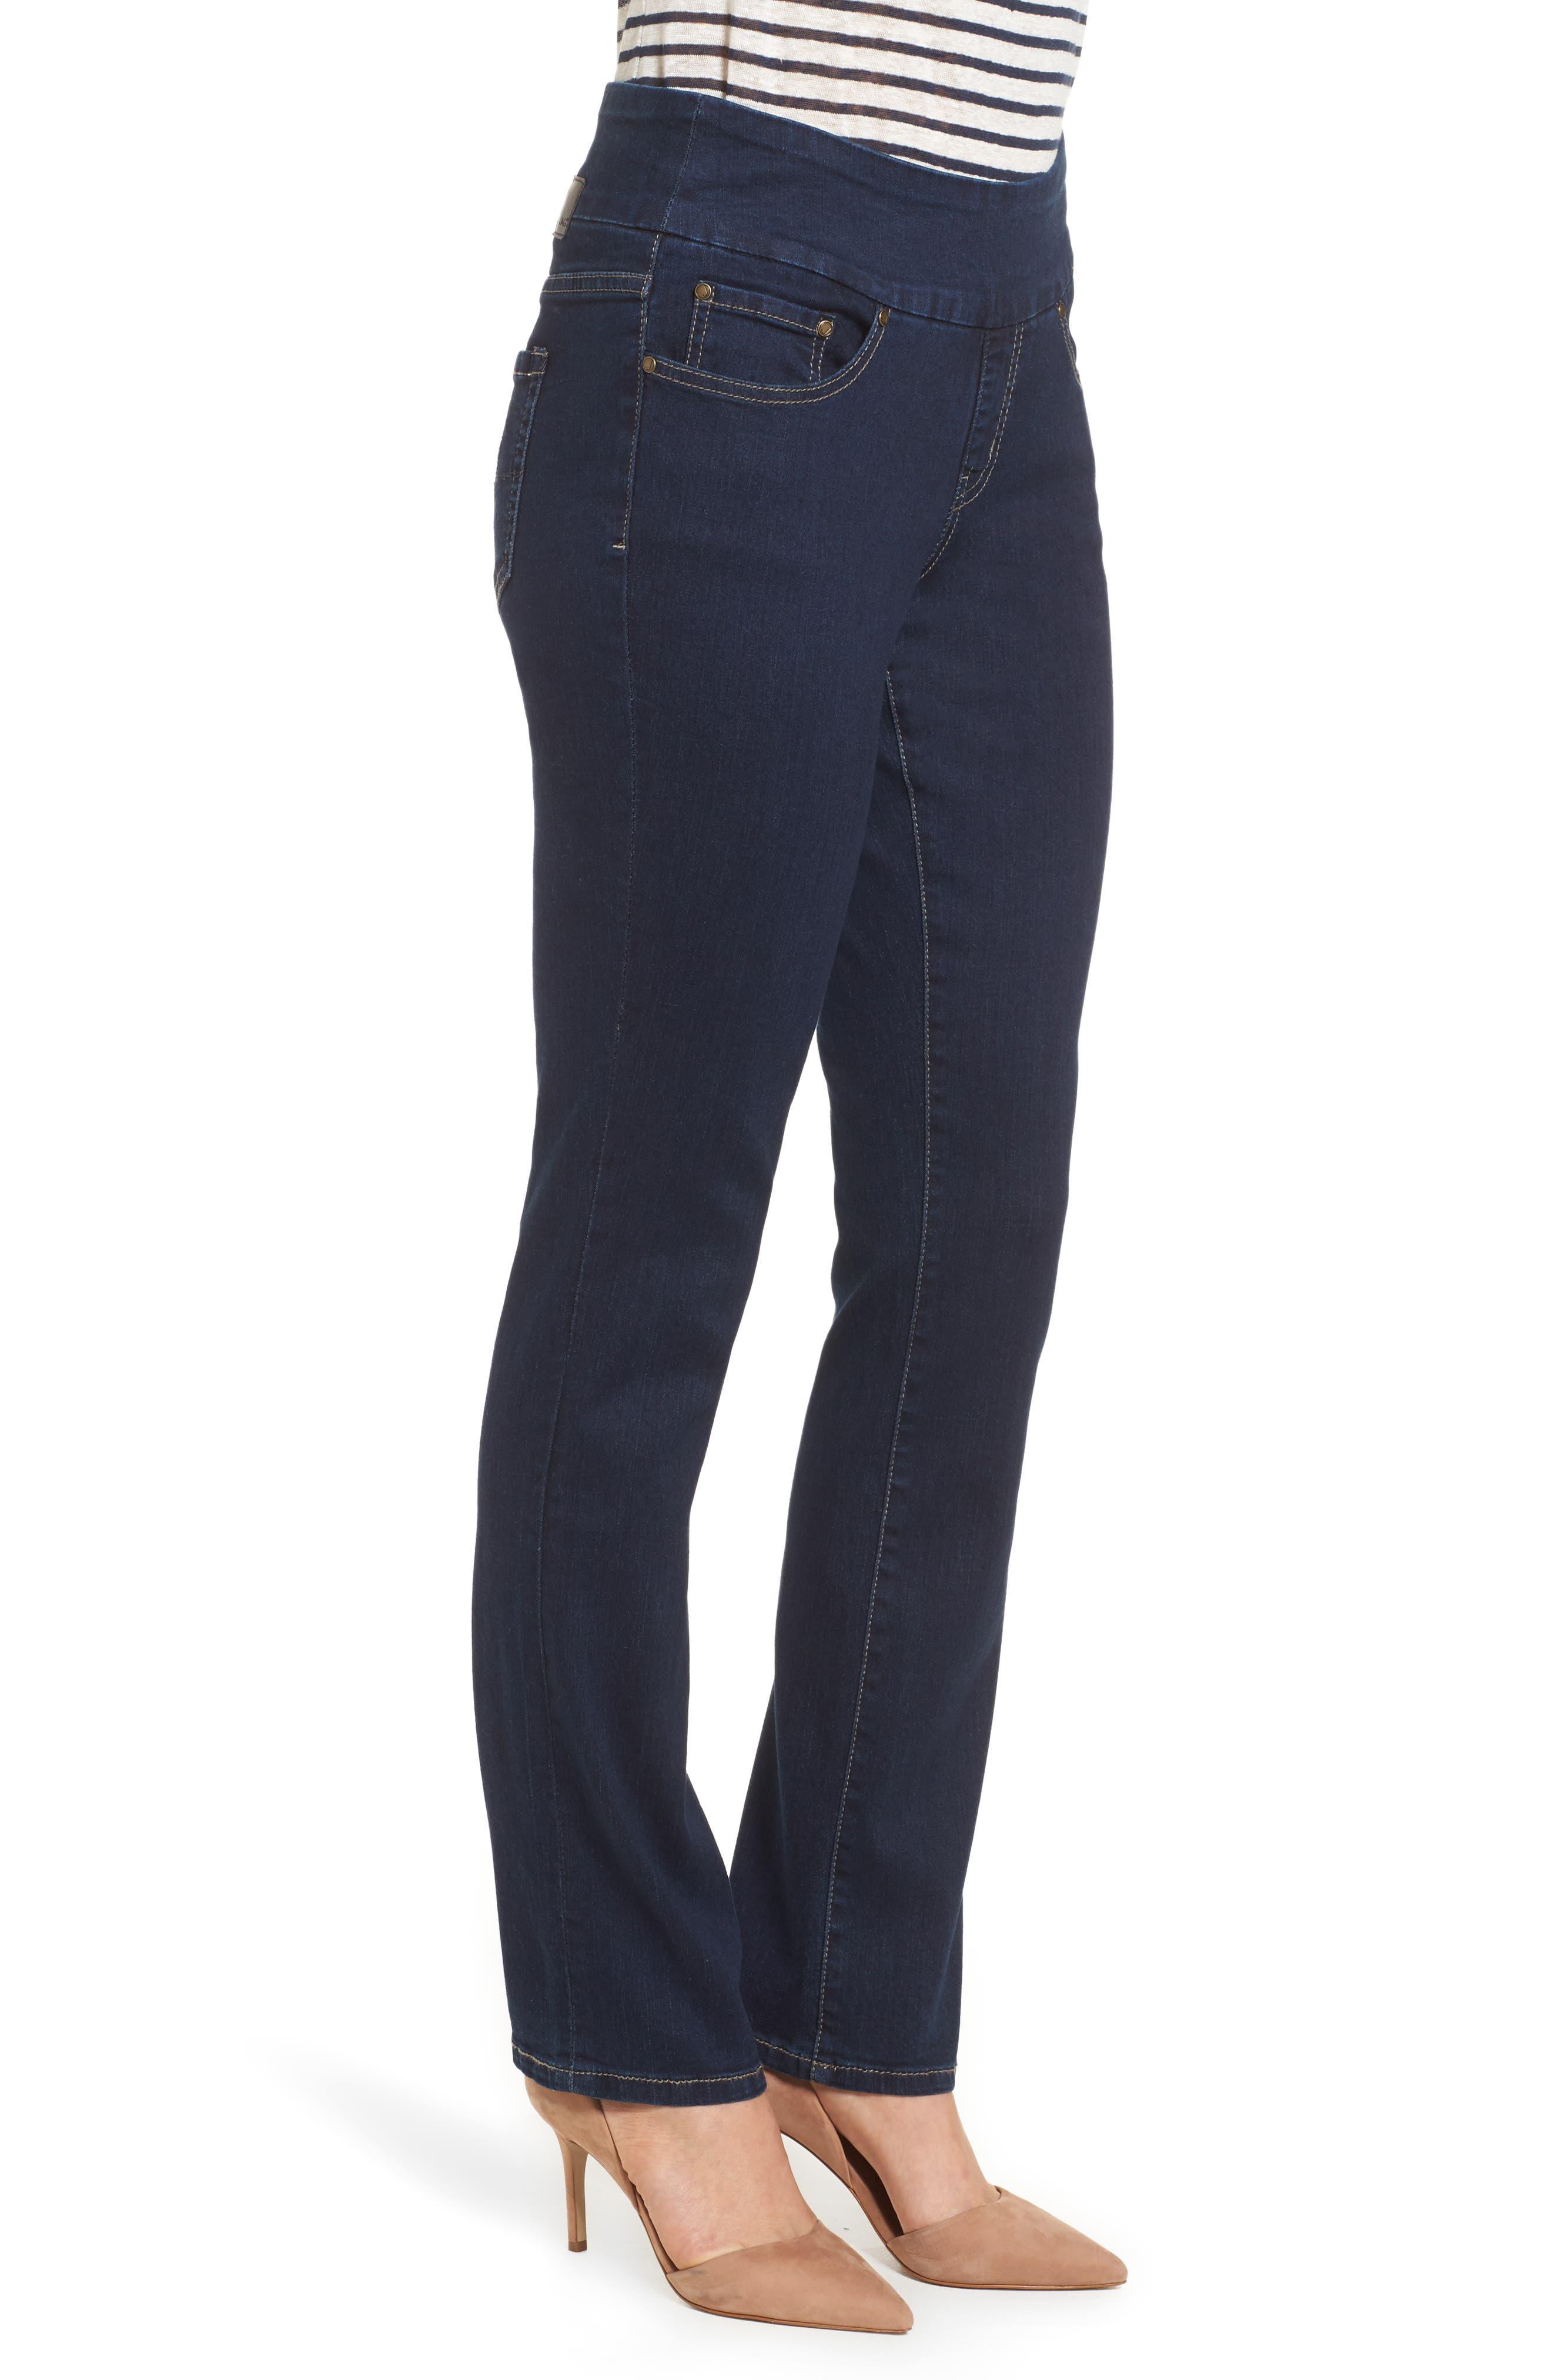 Peri Pull-On Straight Leg Jeans,                             Alternate thumbnail 3, color,                             DARK INDIGO